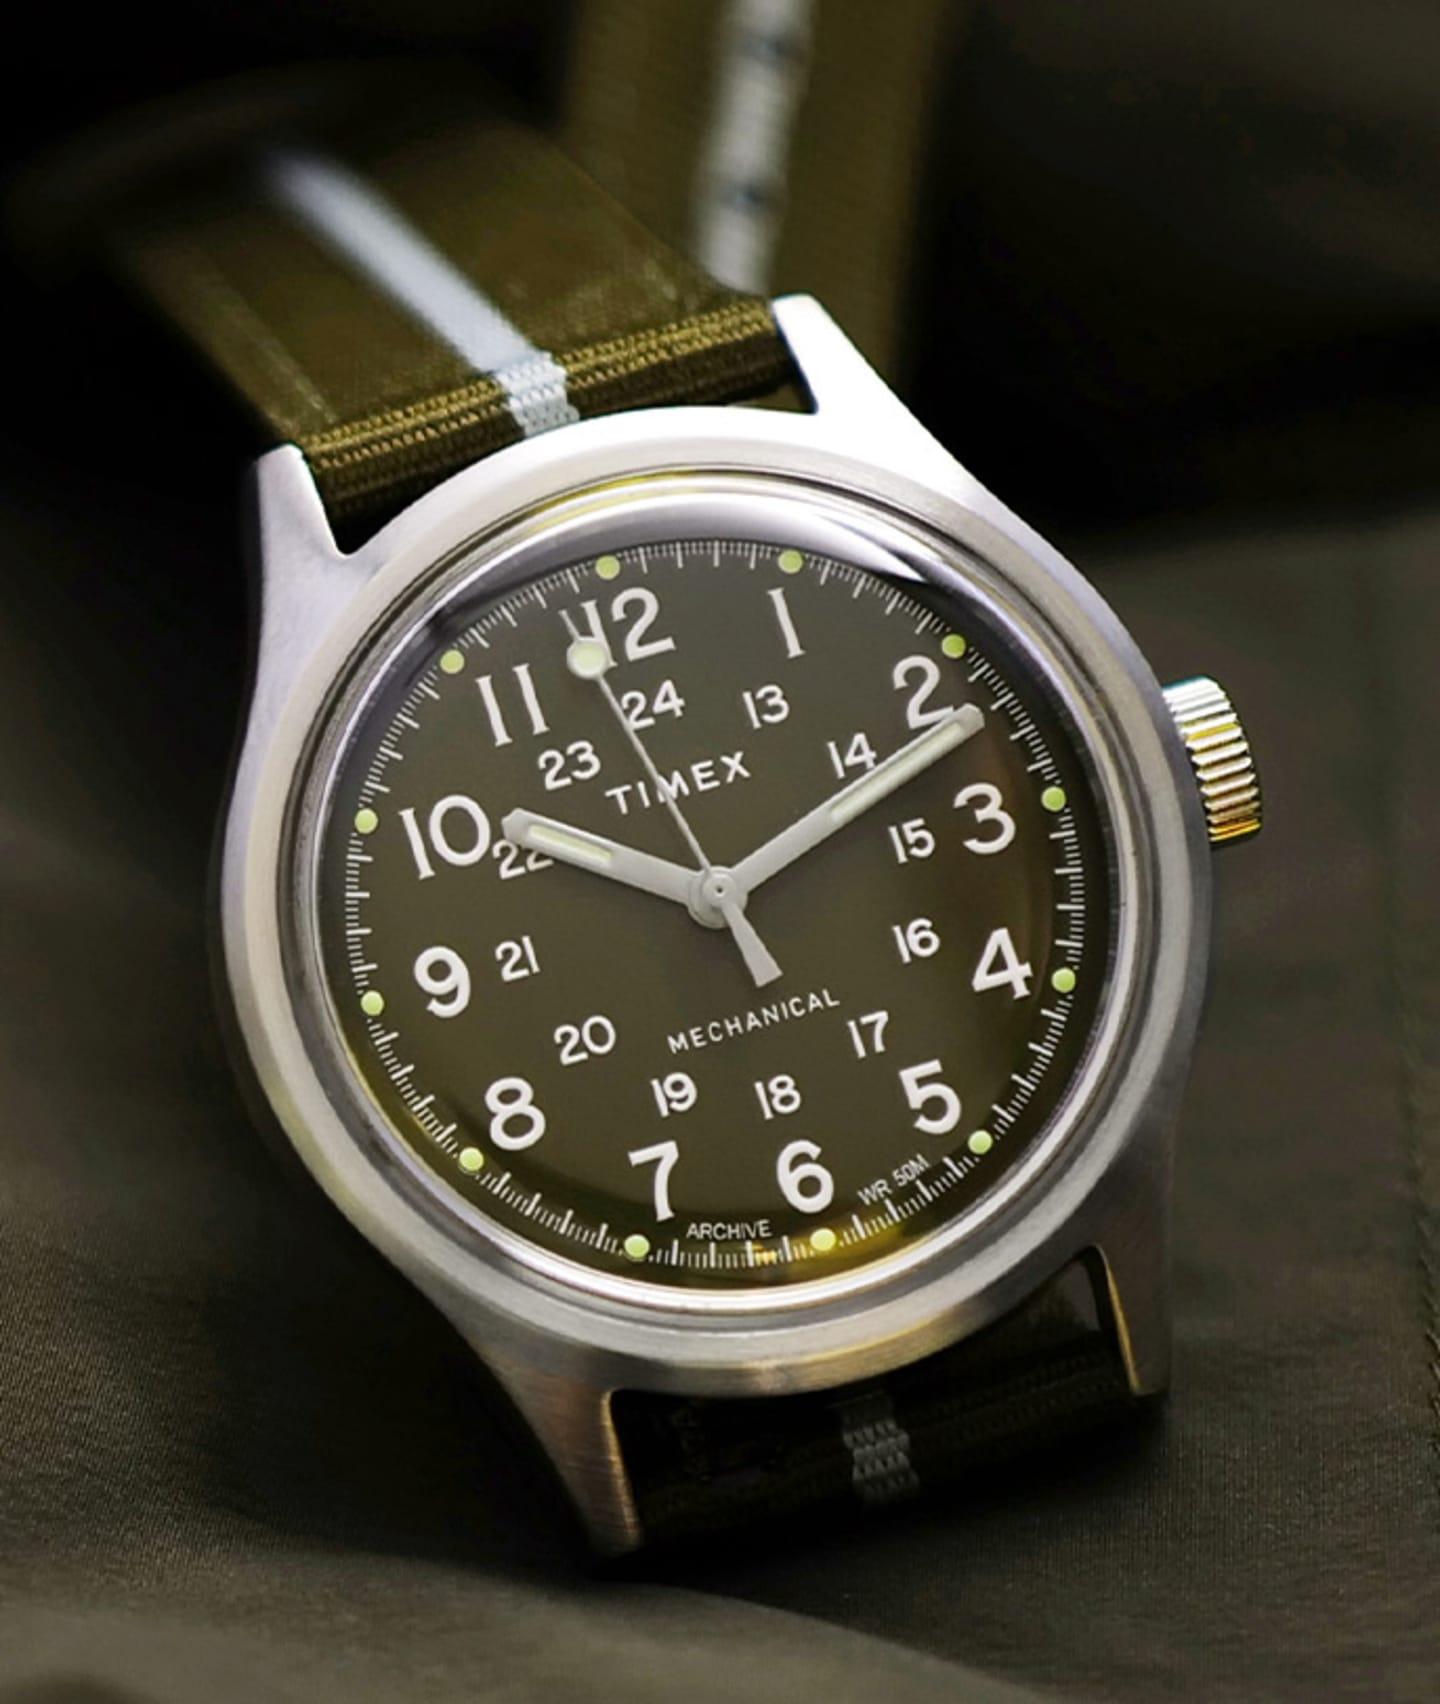 MK1 Mechanical Watch.